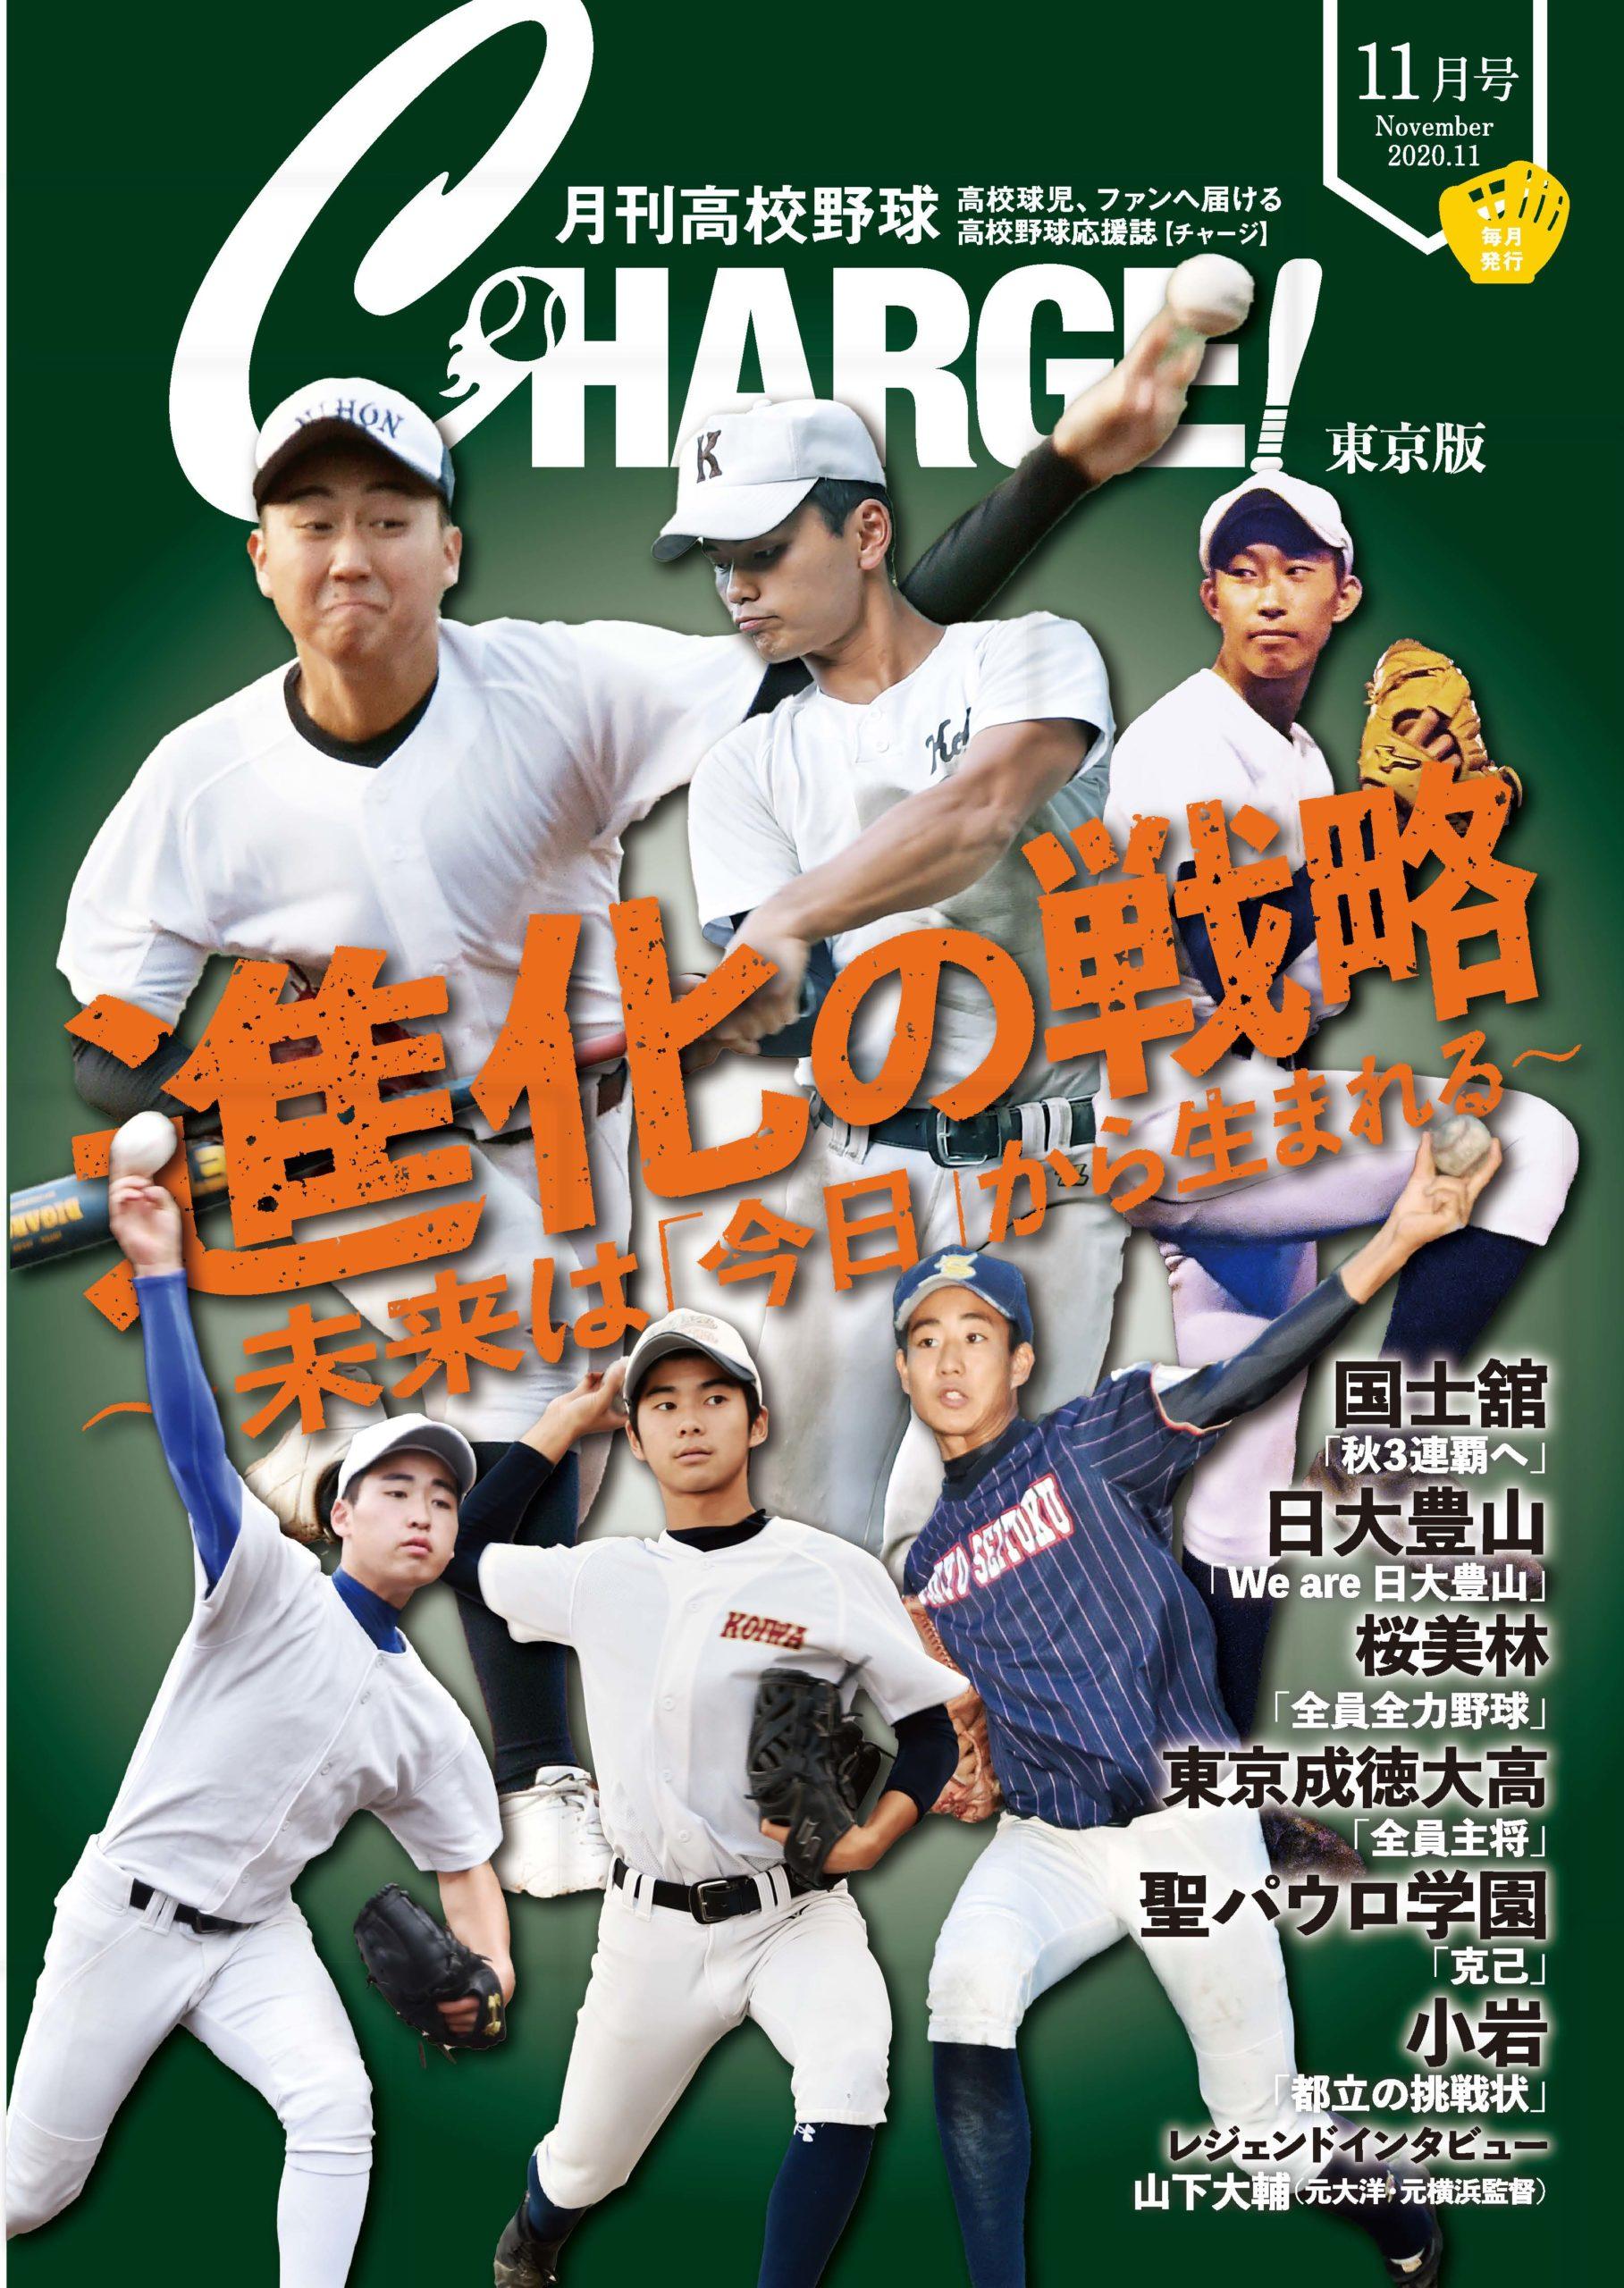 【配布開始!】 月刊高校野球チャージ11月号